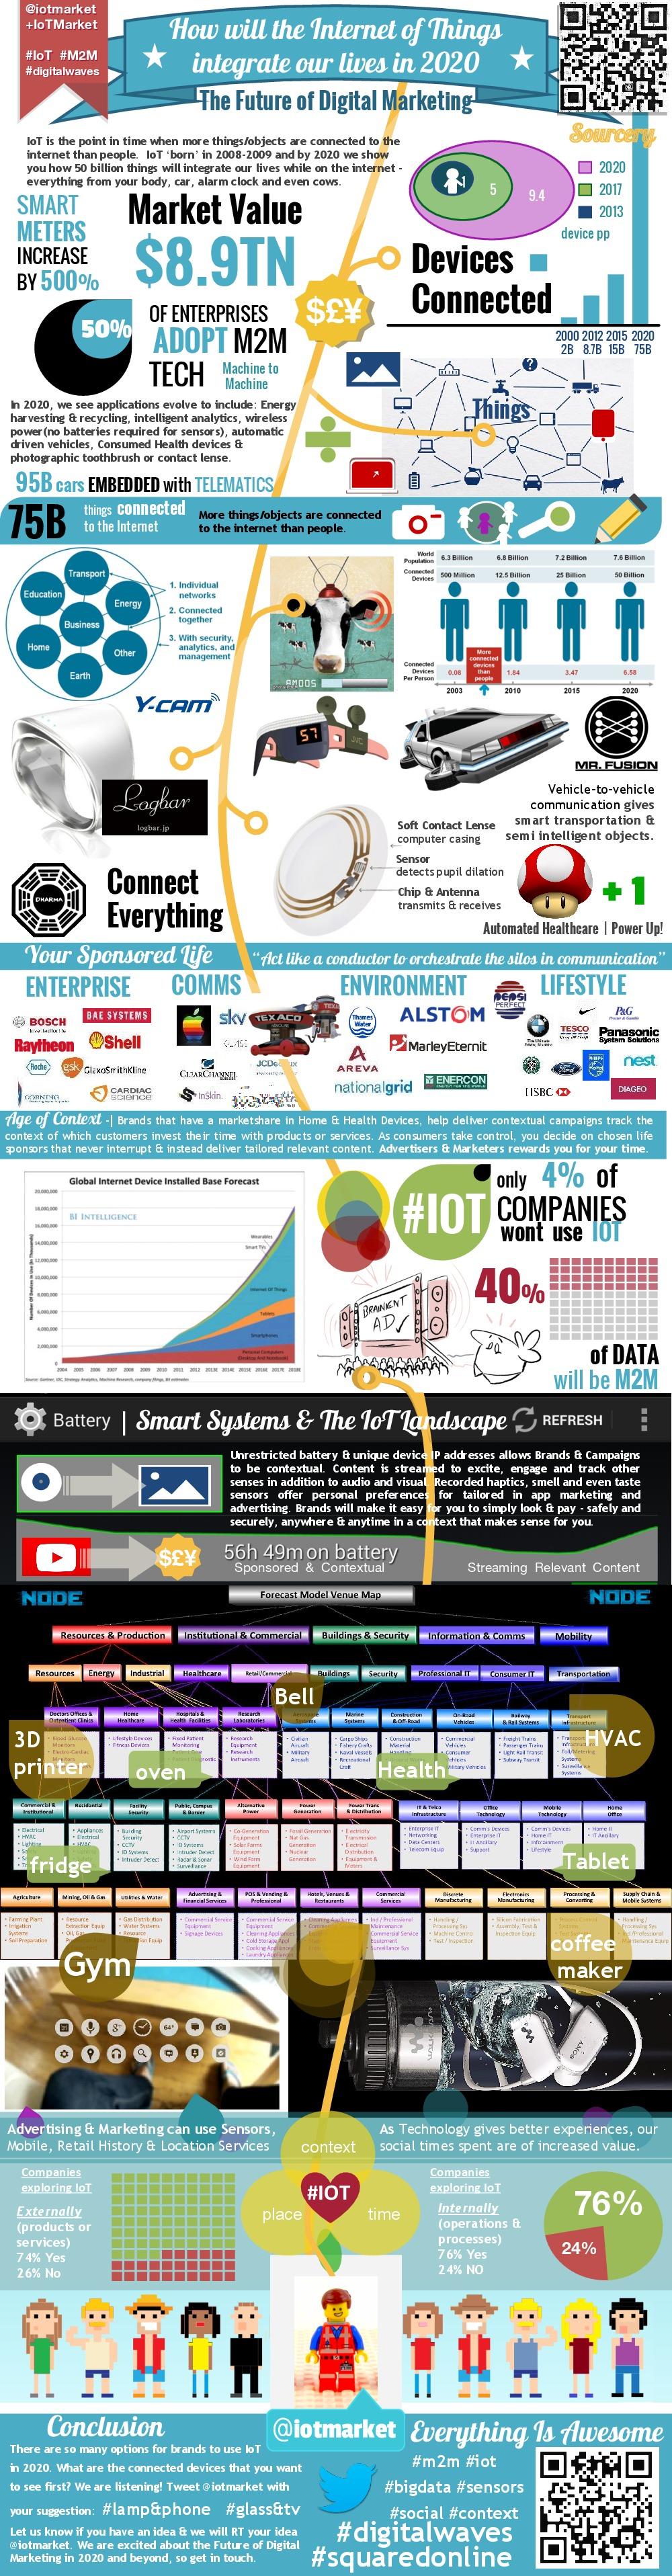 infografia_internet_de_las_cosas_en_2020.jpg (1000×3833)